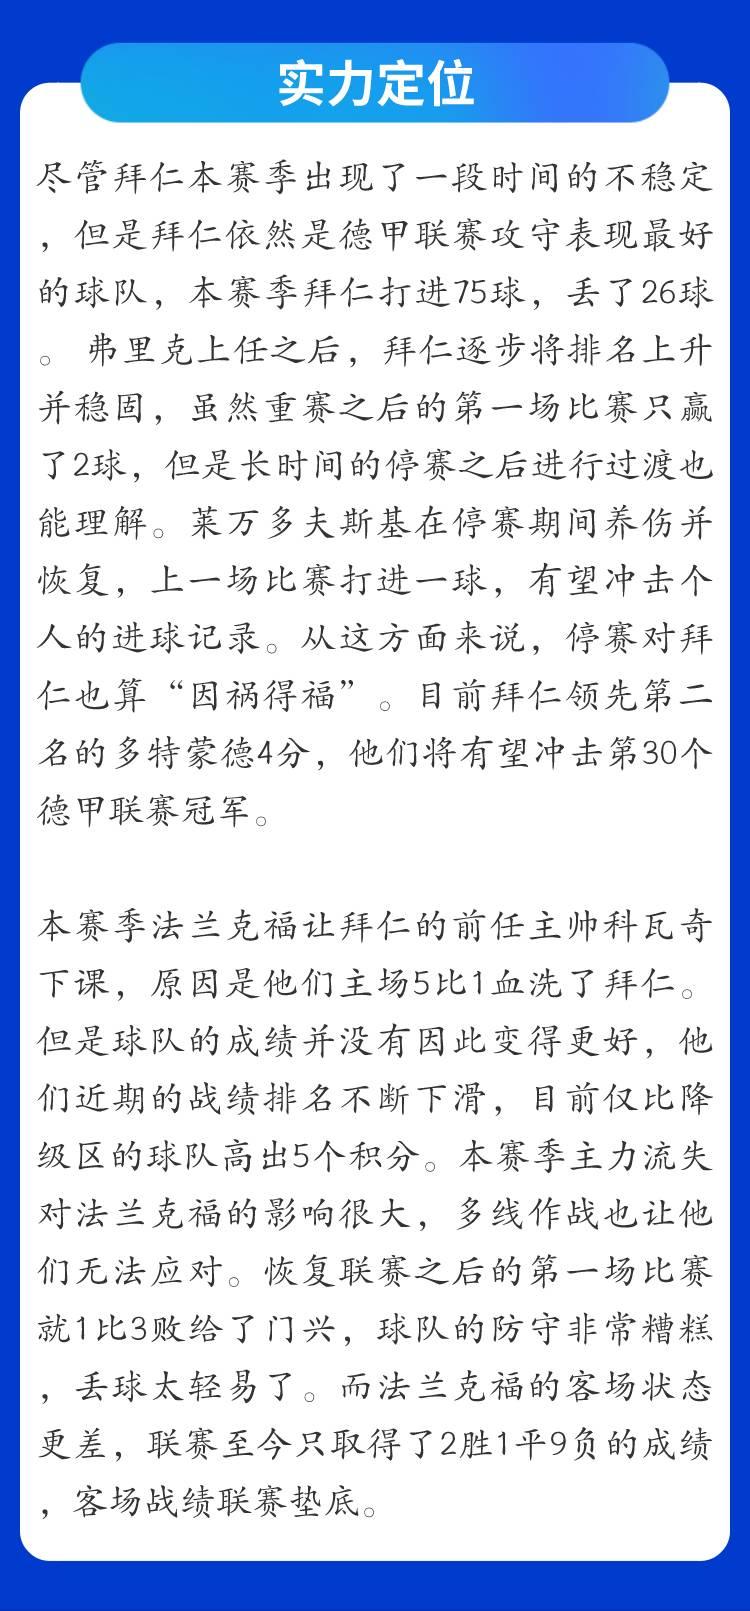 https://cdn.ttyingqiu.com/news/image/2020/5/22/202005222144000034.jpg